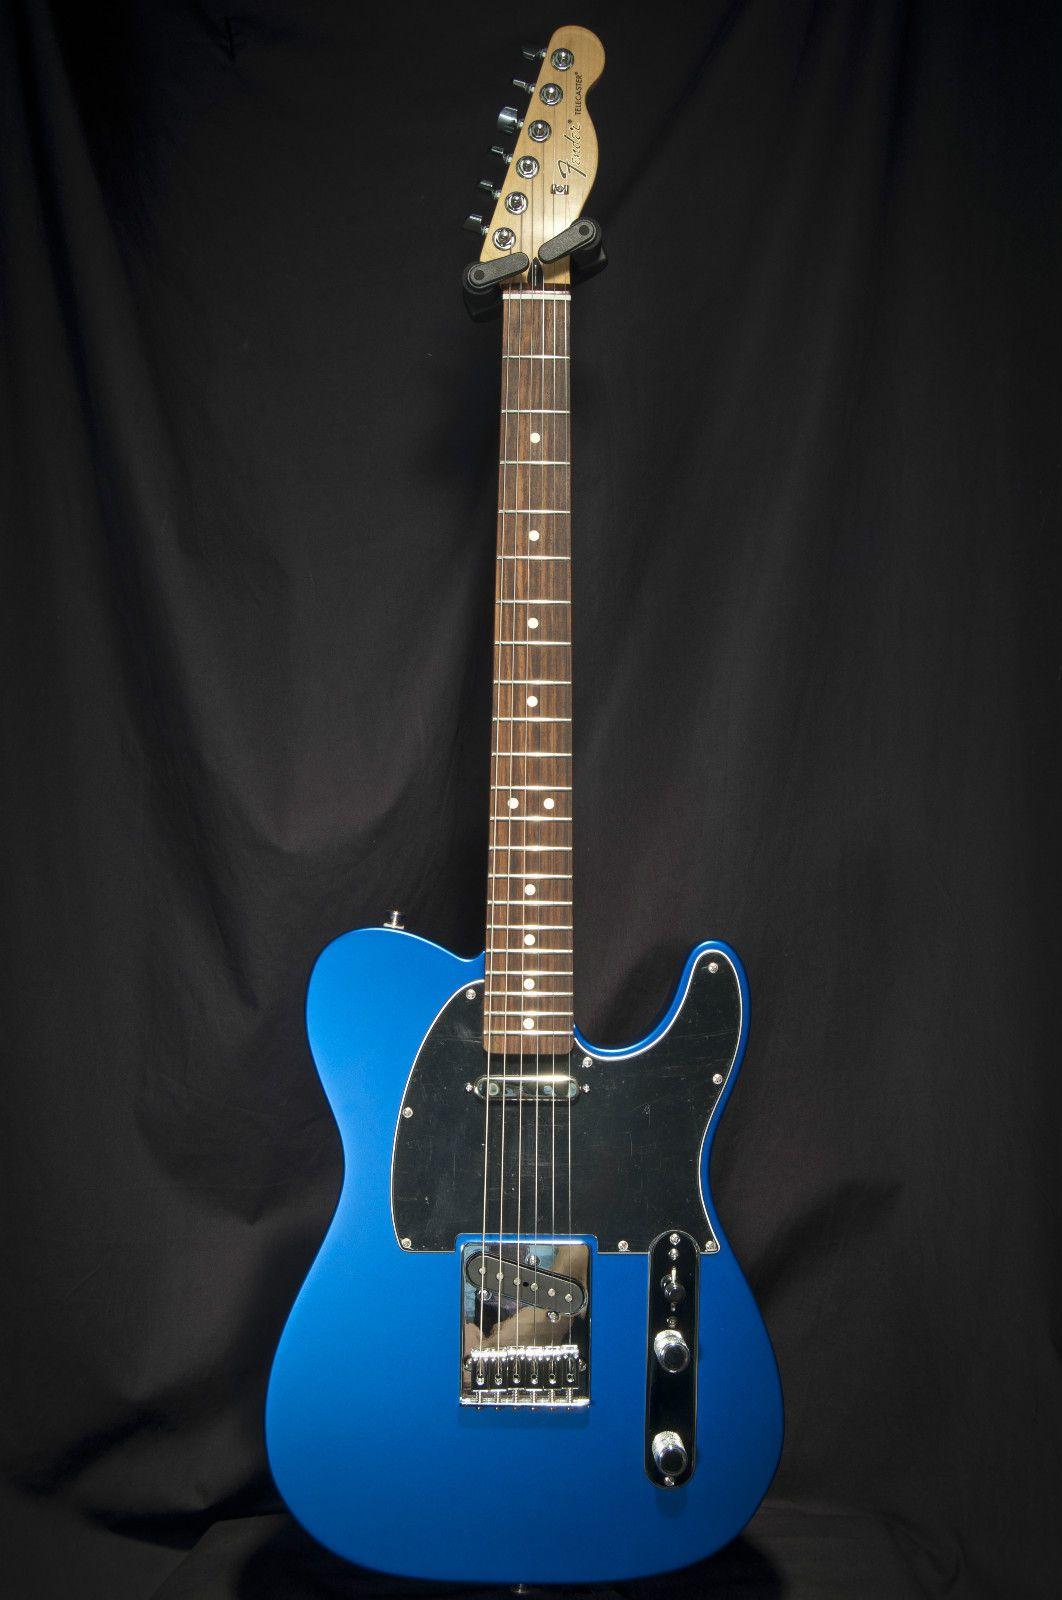 fender standard telecaster satin ocean blue electric guitar only guitar collectibles. Black Bedroom Furniture Sets. Home Design Ideas